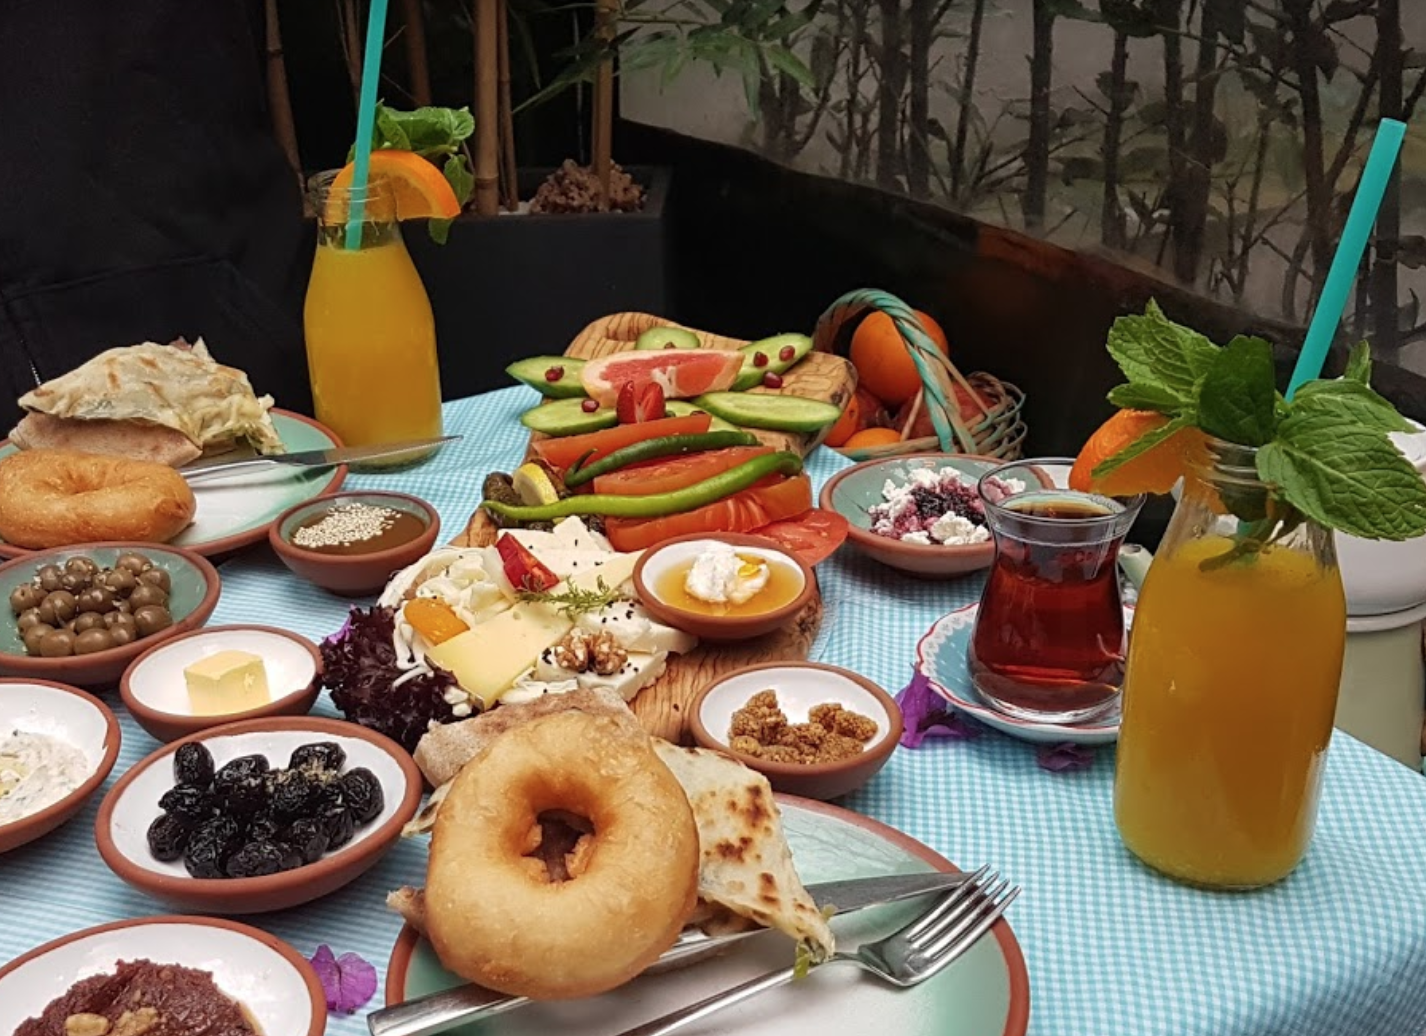 Ресторан Çeşme Bazlama Kahvaltı в Стамбуле